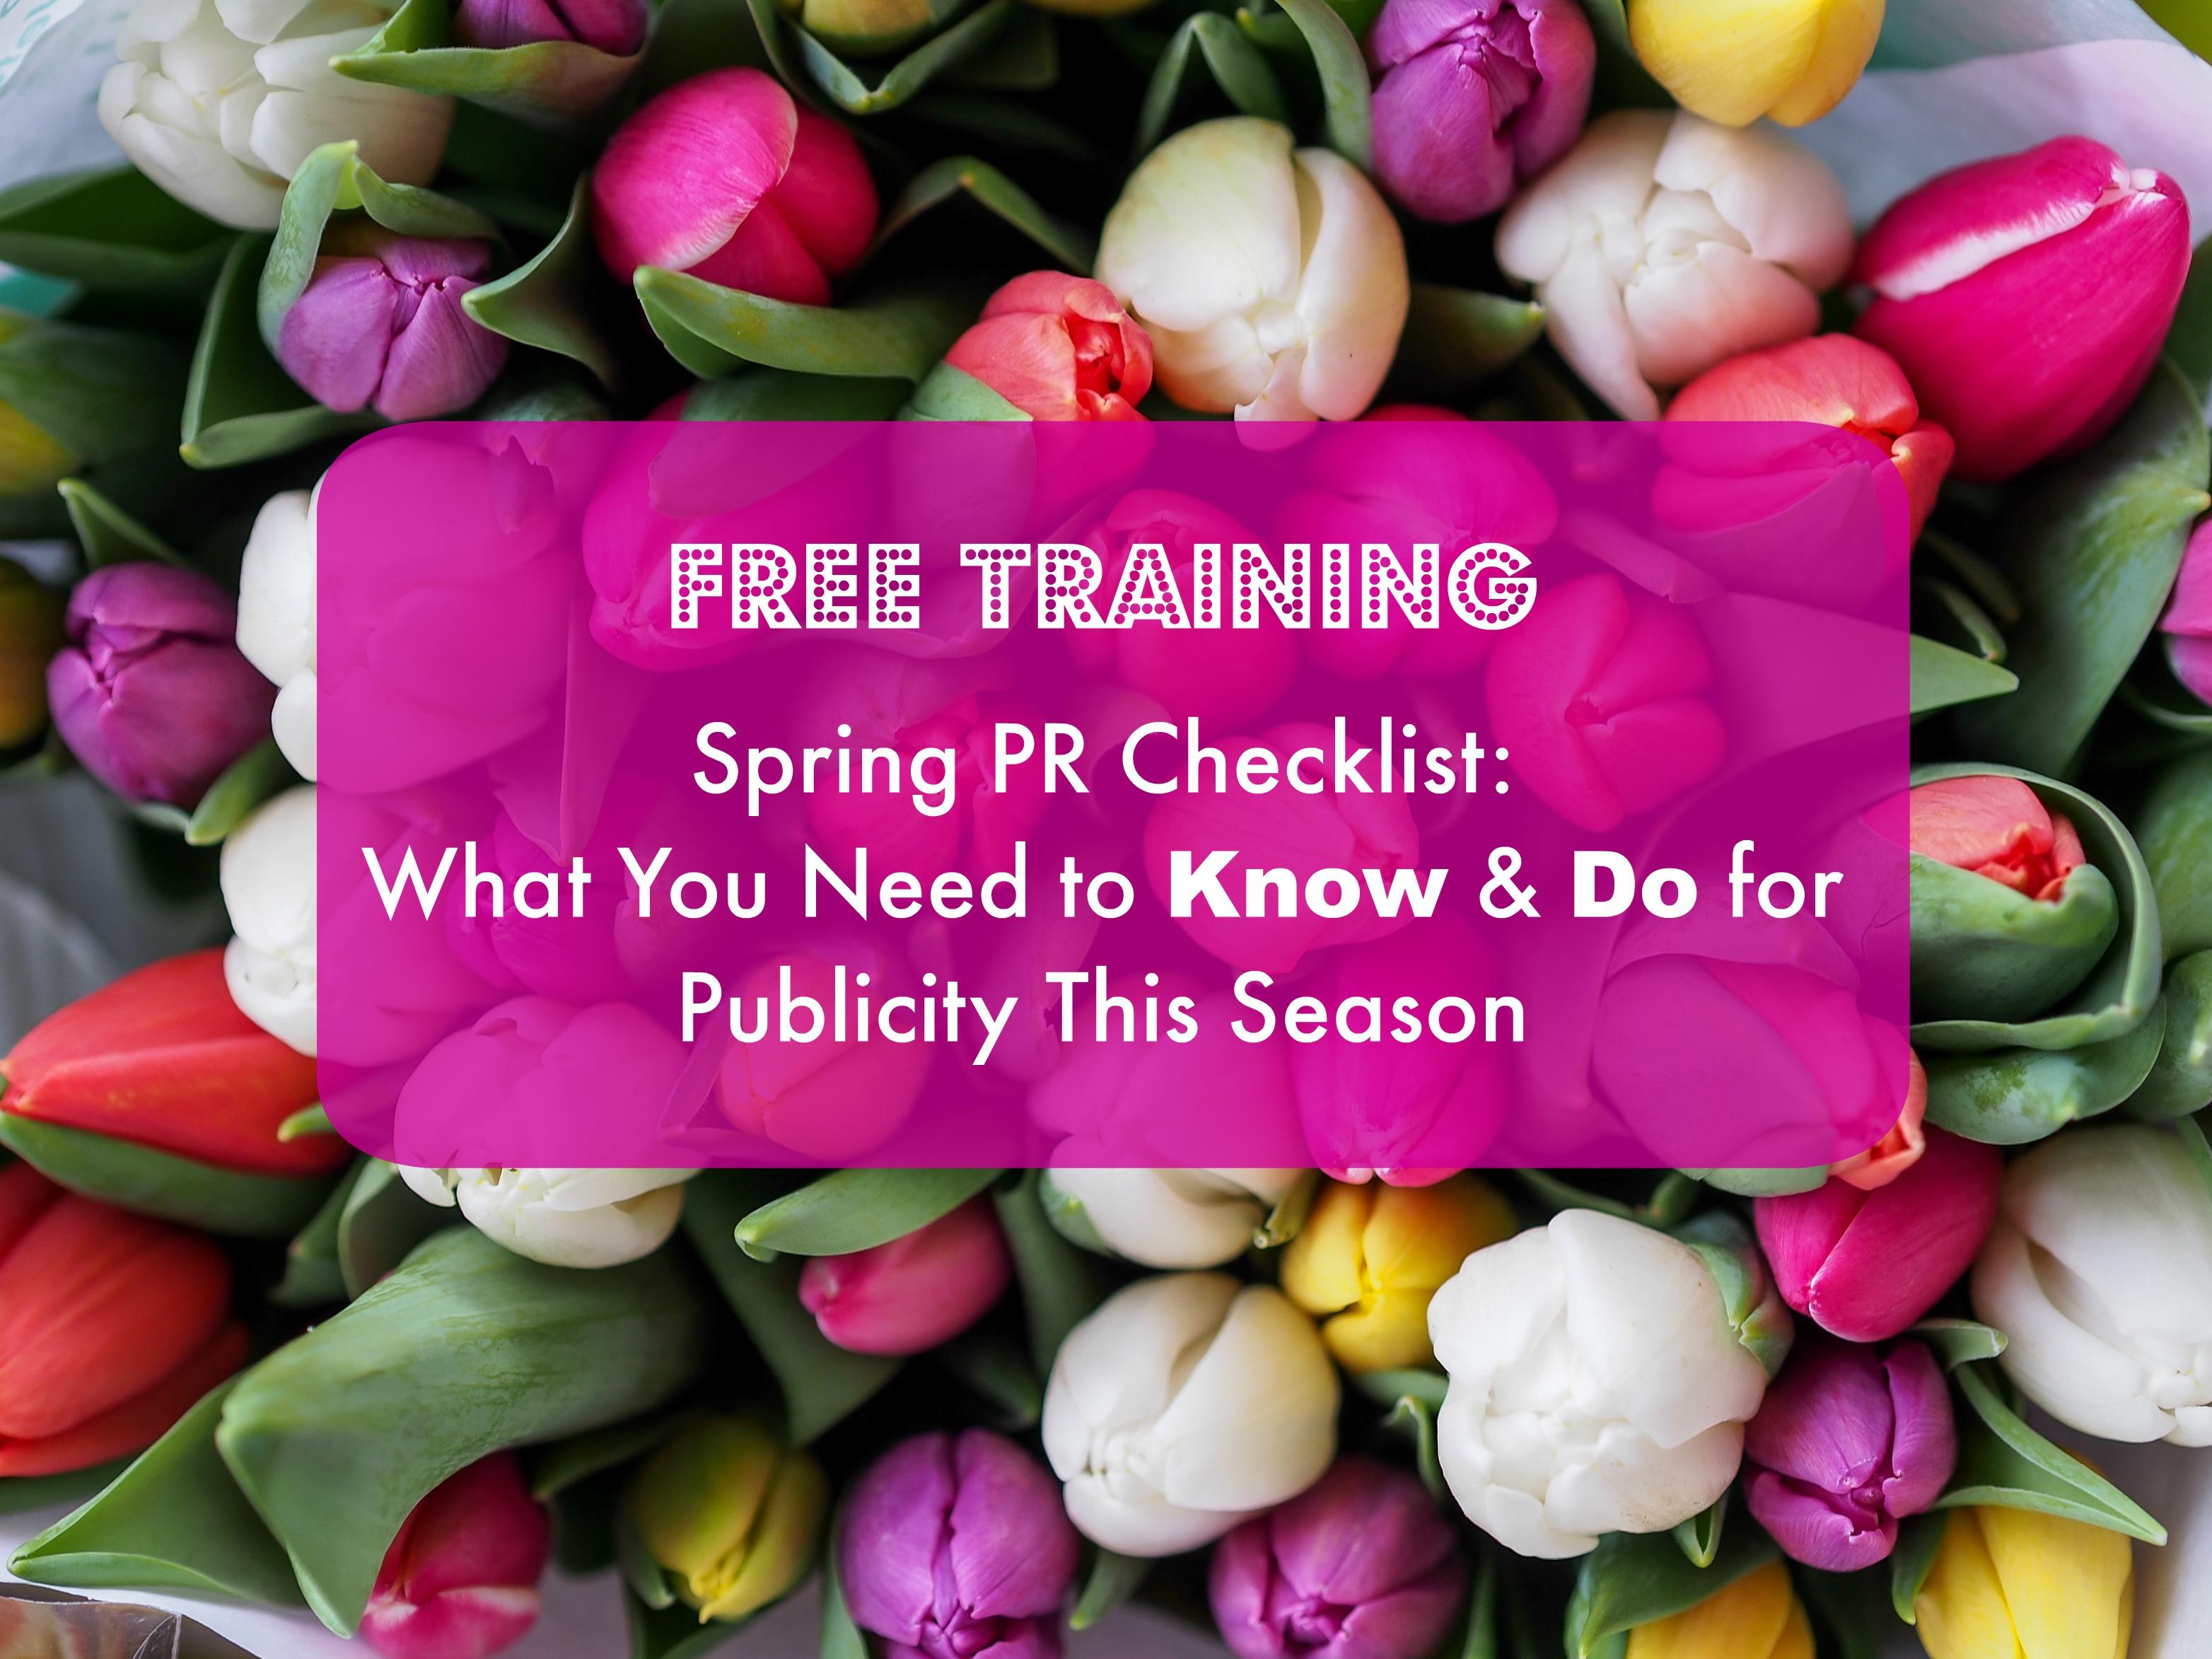 Spring PR Checklist Blog